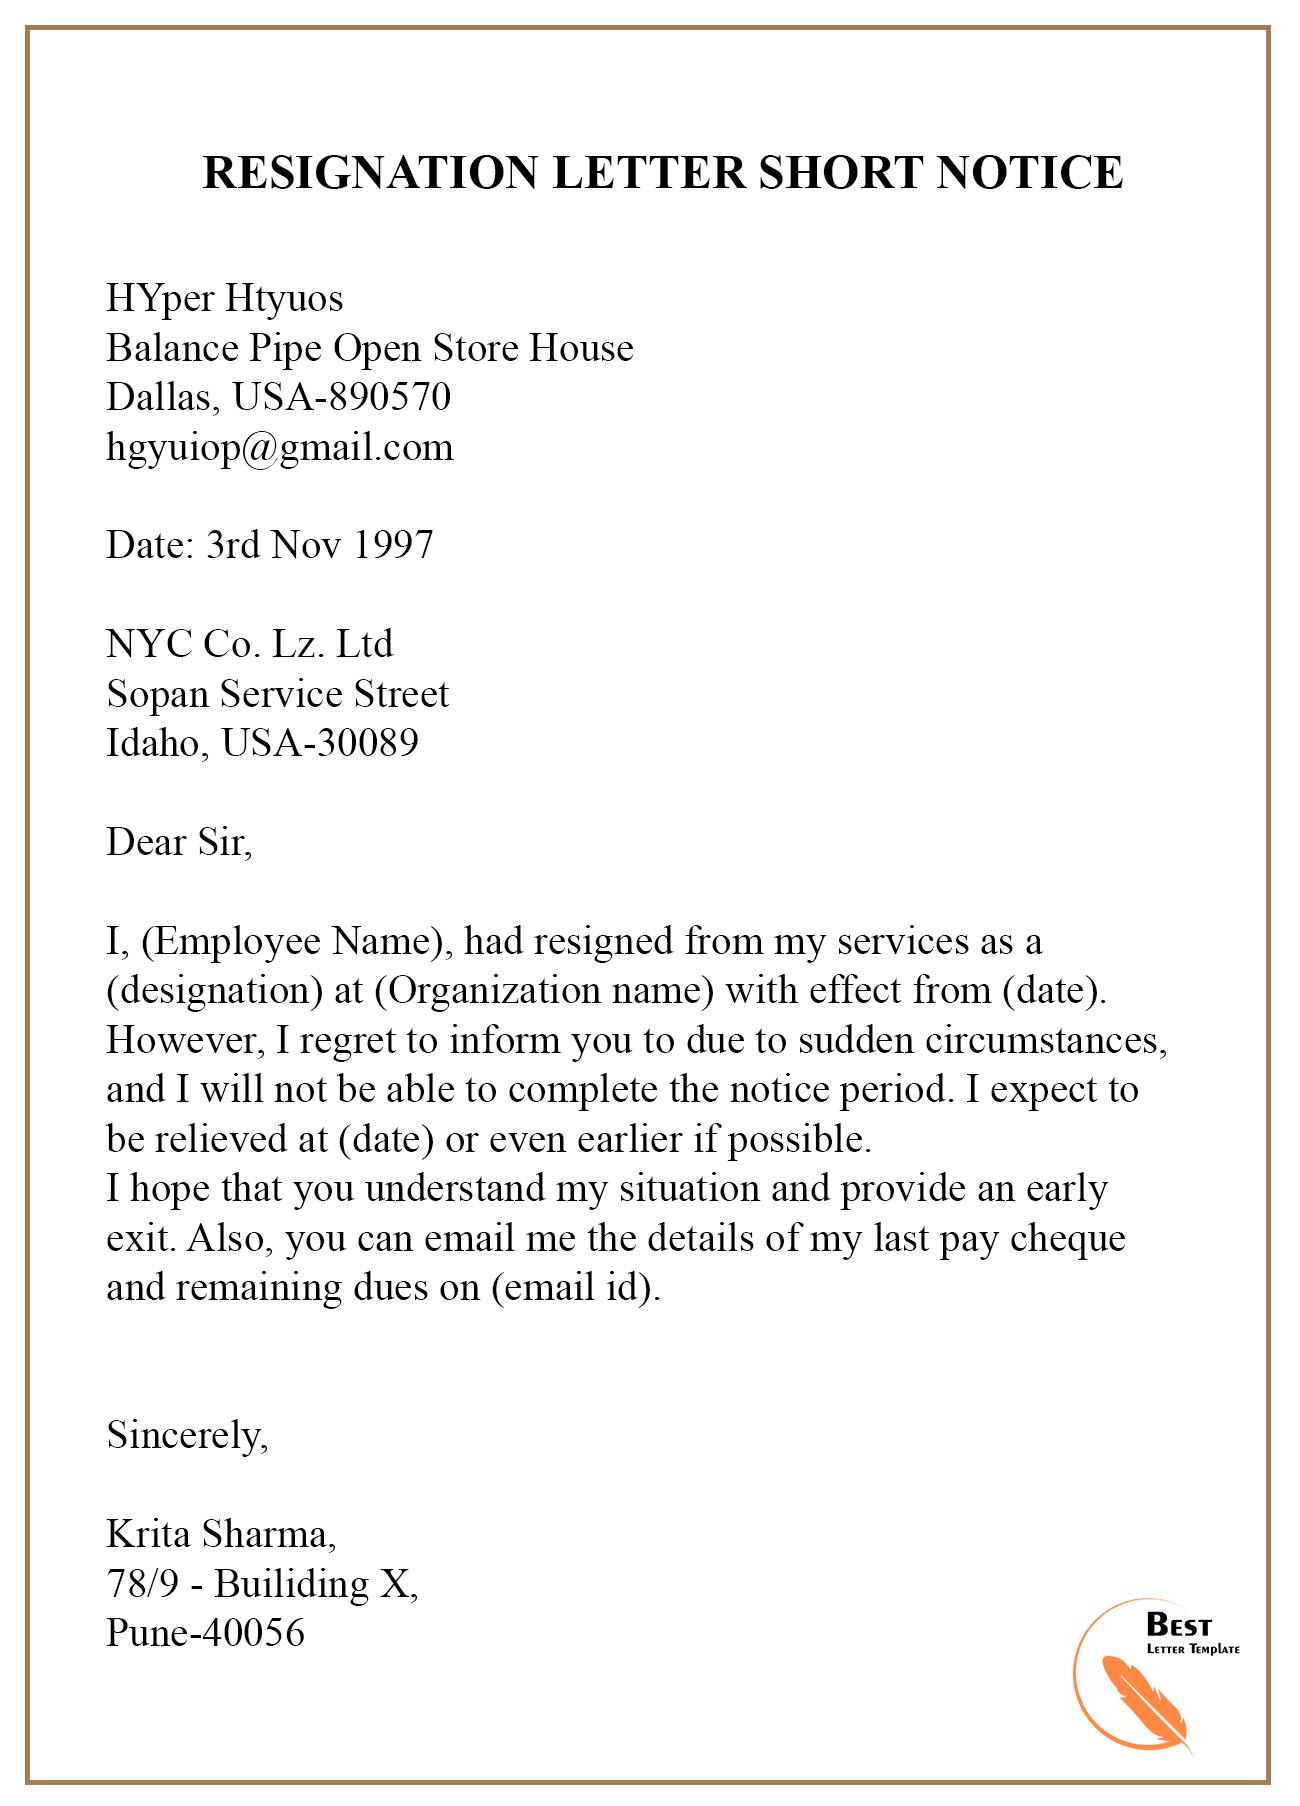 Resignation Letter Example Short Notice from bestlettertemplate.com